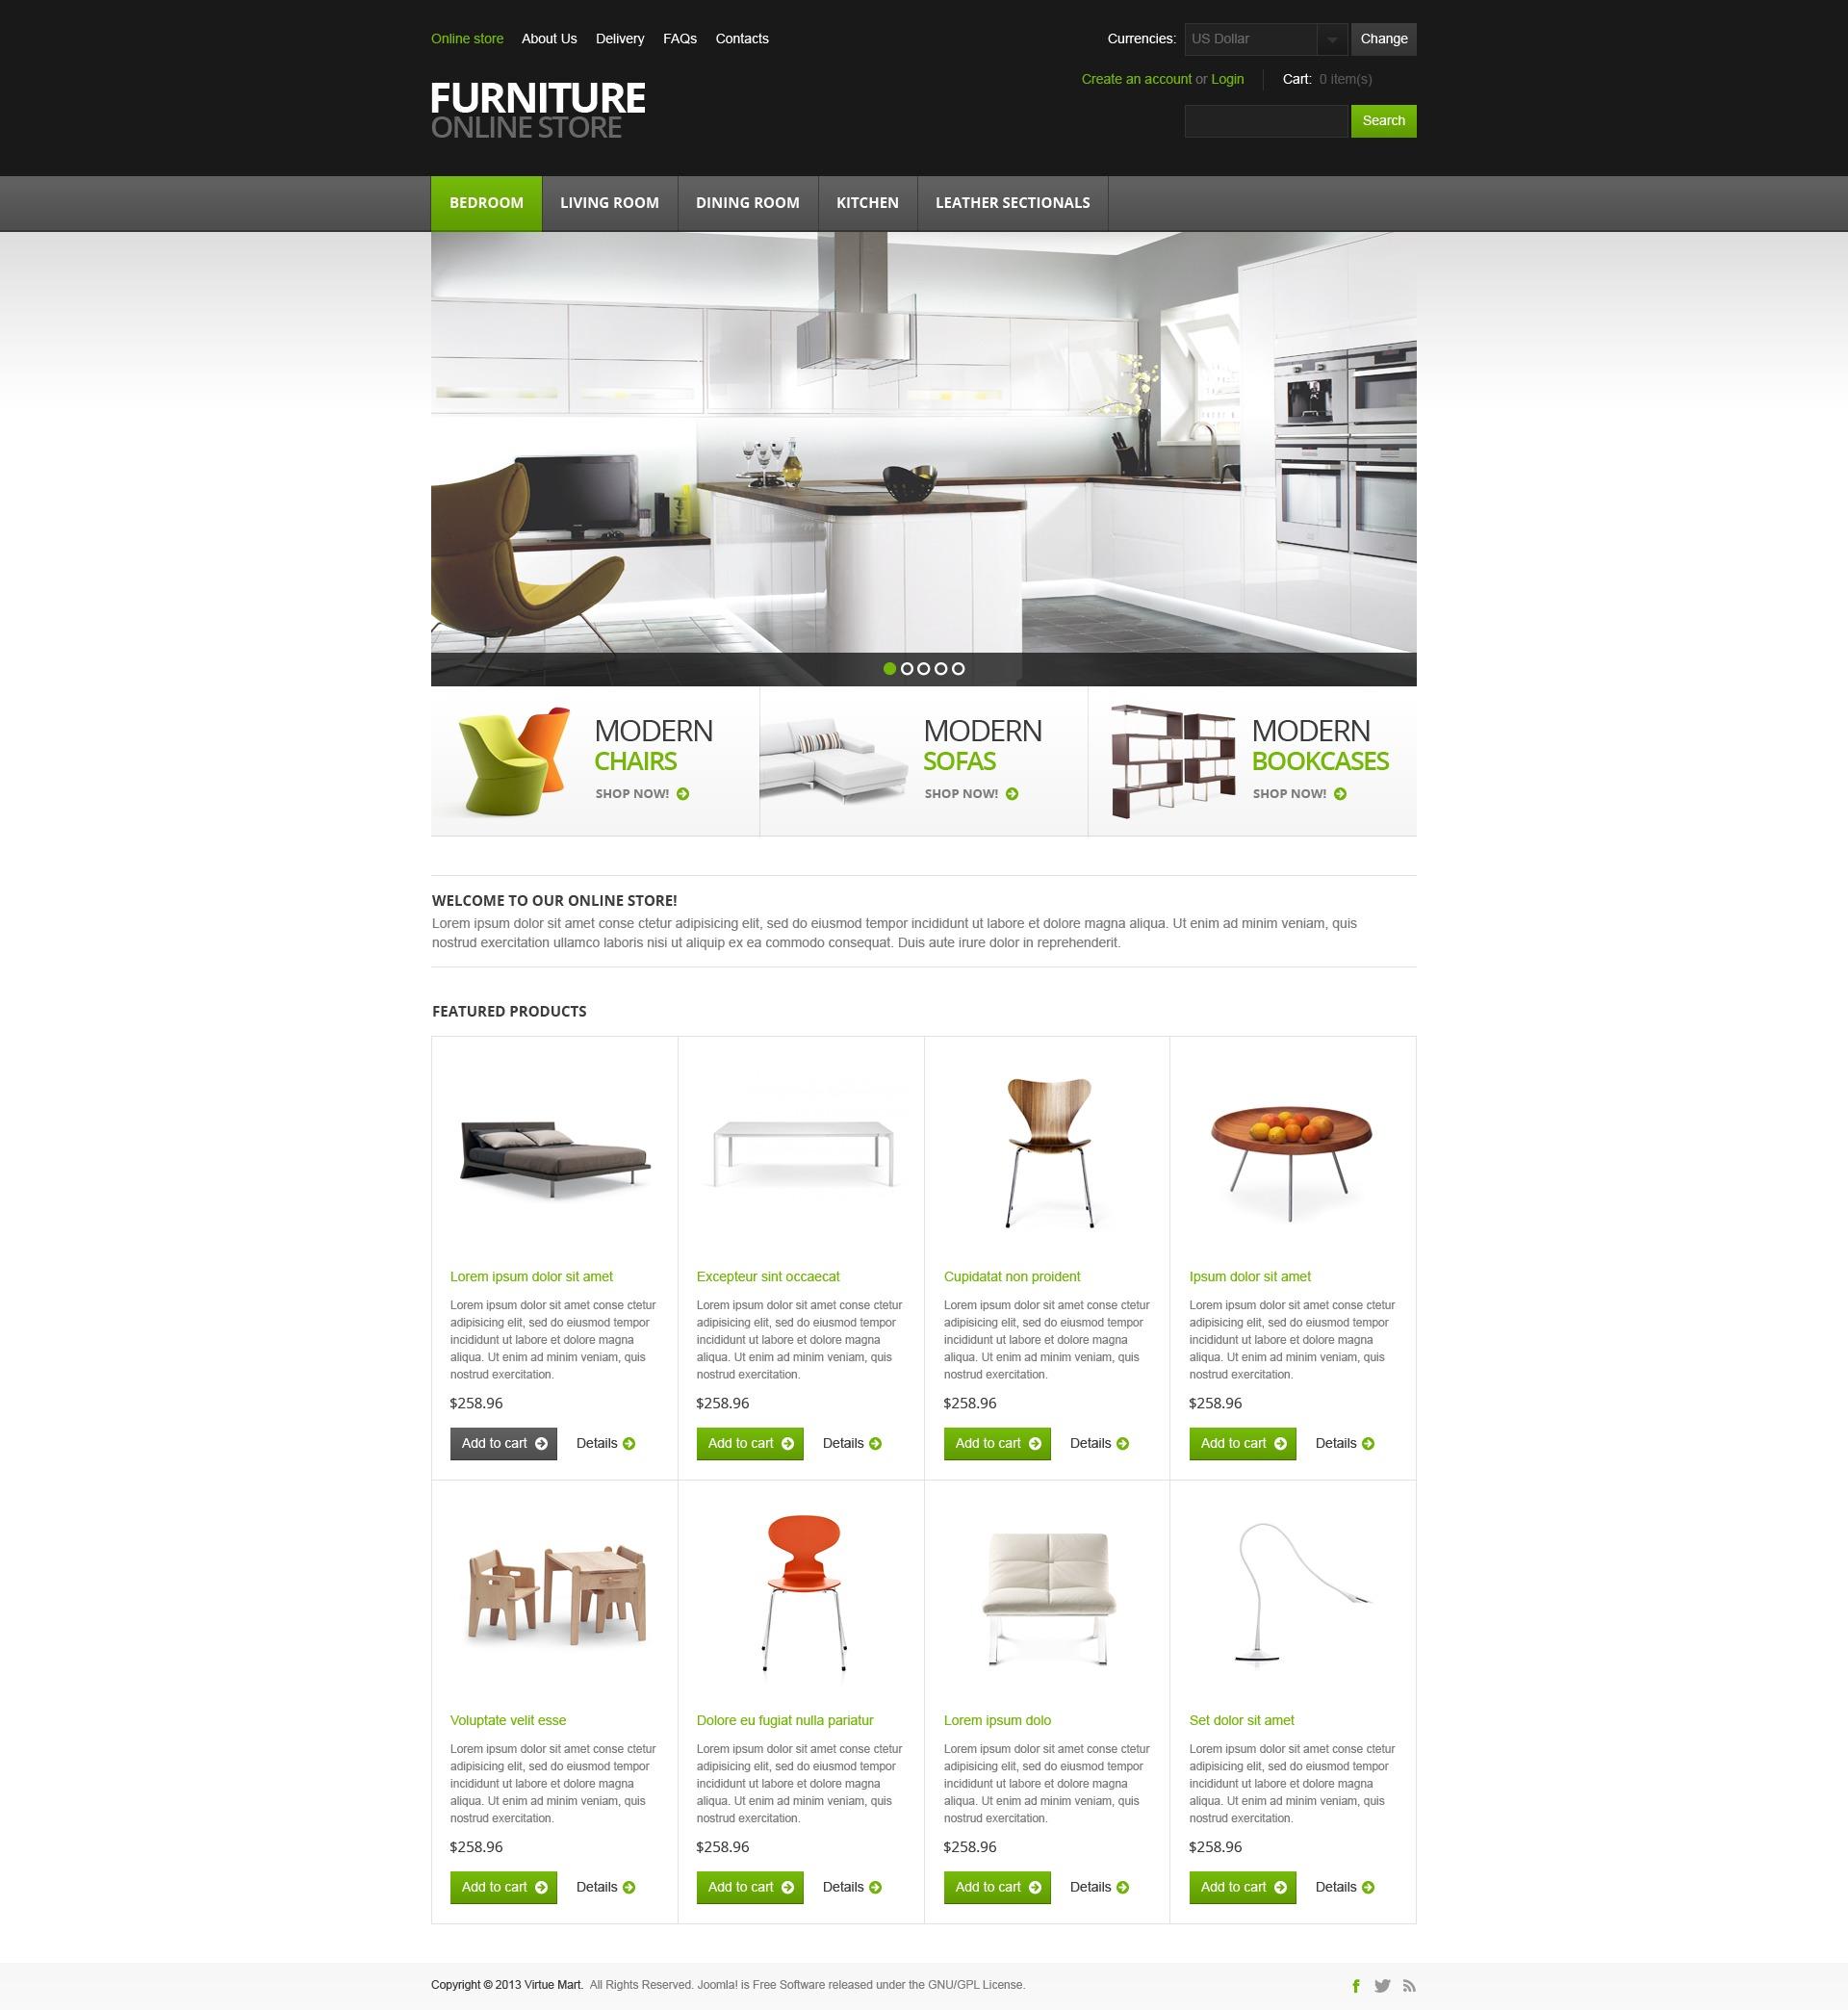 Furniture for Comfort №44973 - скриншот